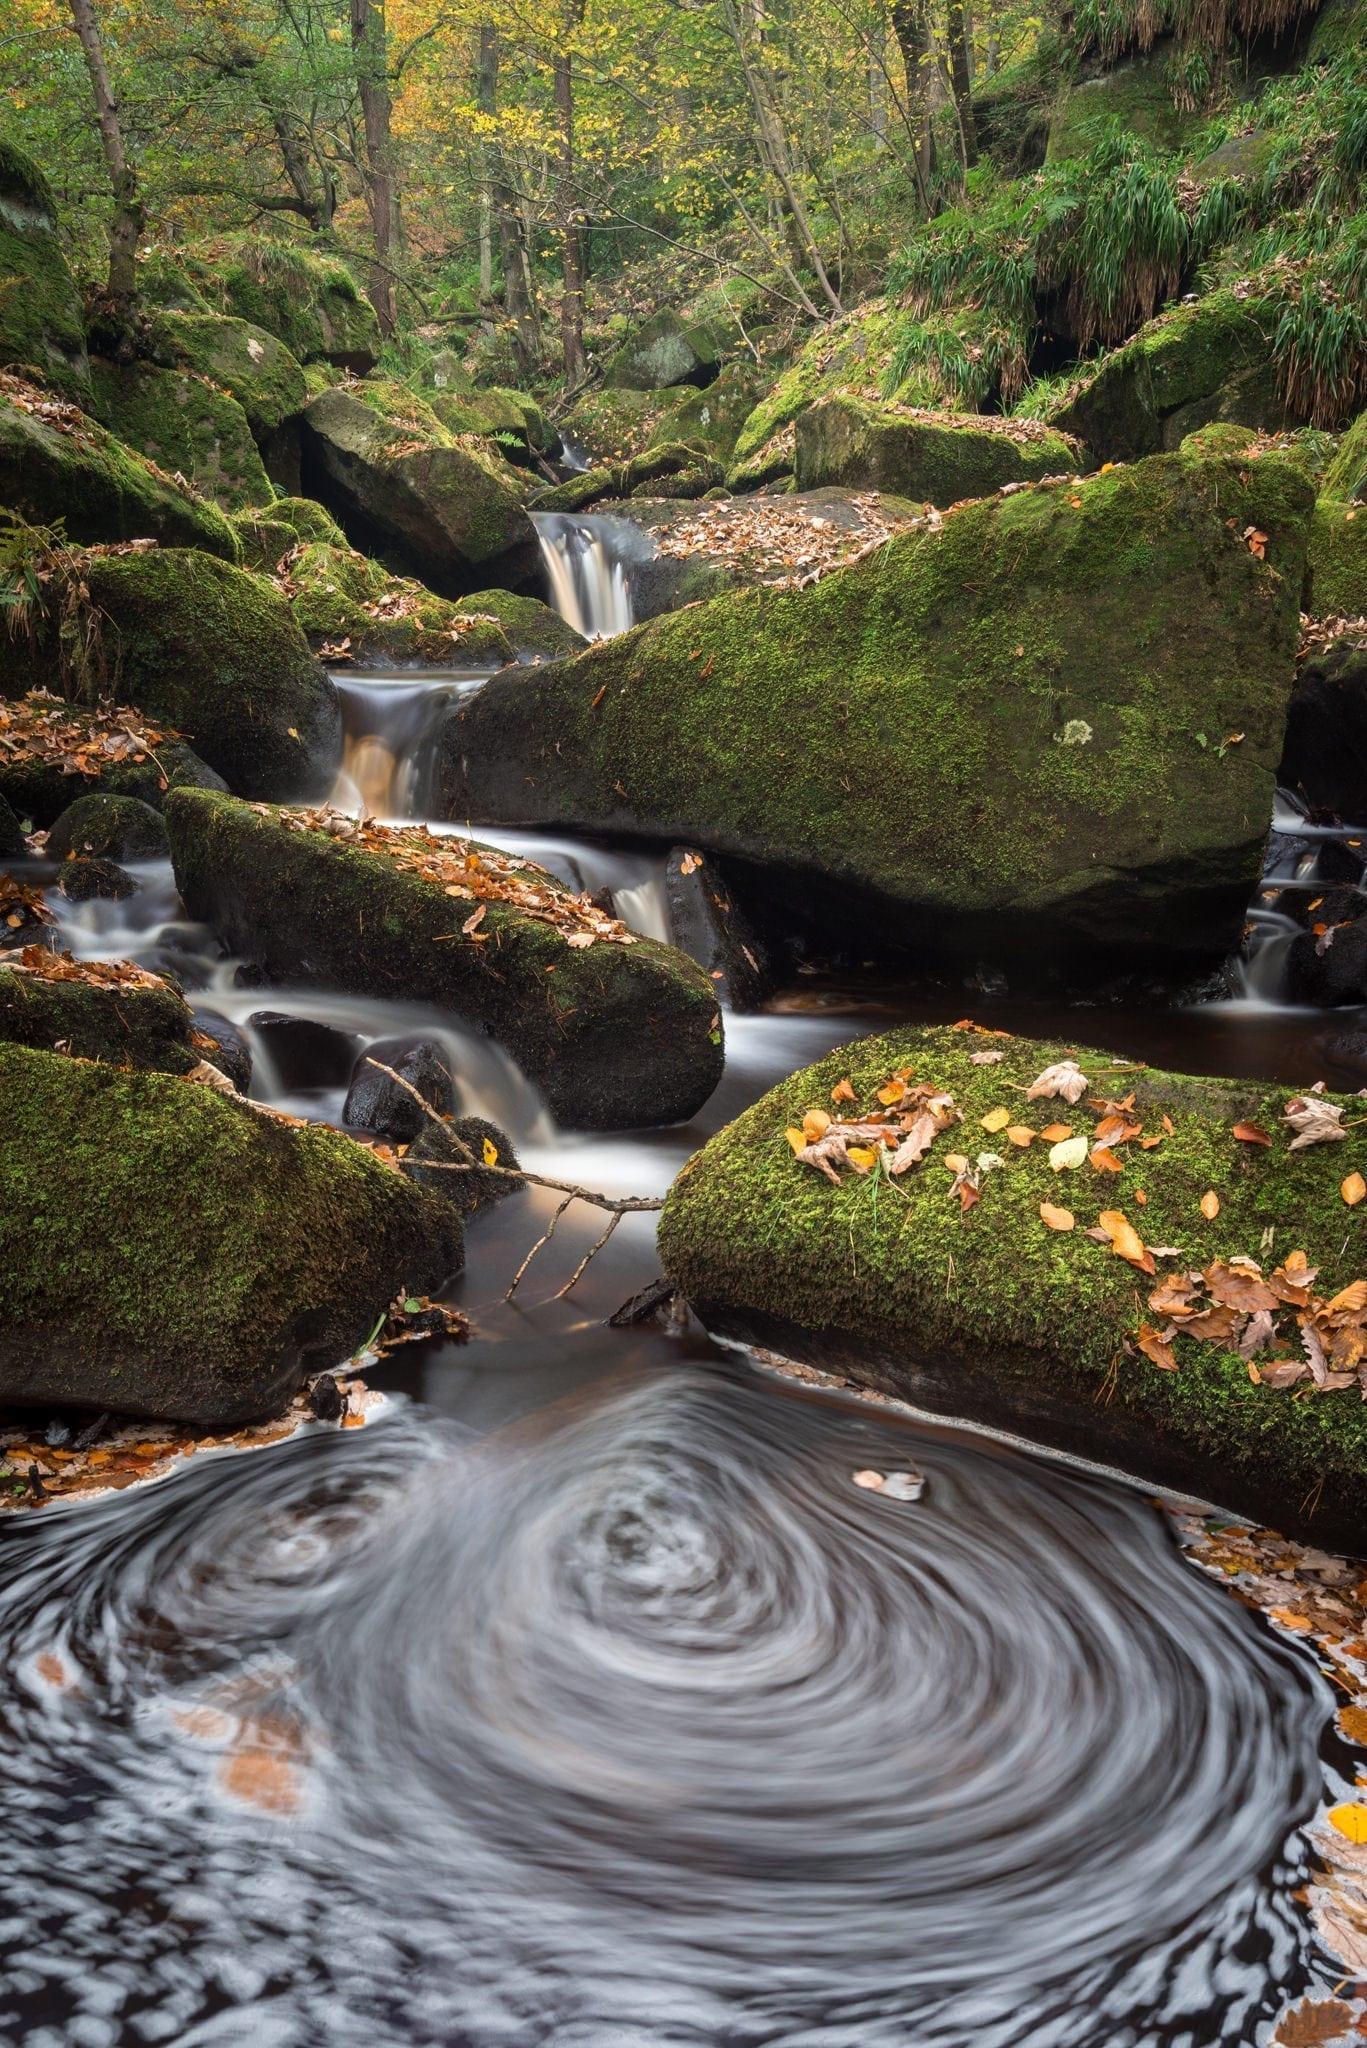 Padley Gorge Autumn Whirlpool - Peak District Photography